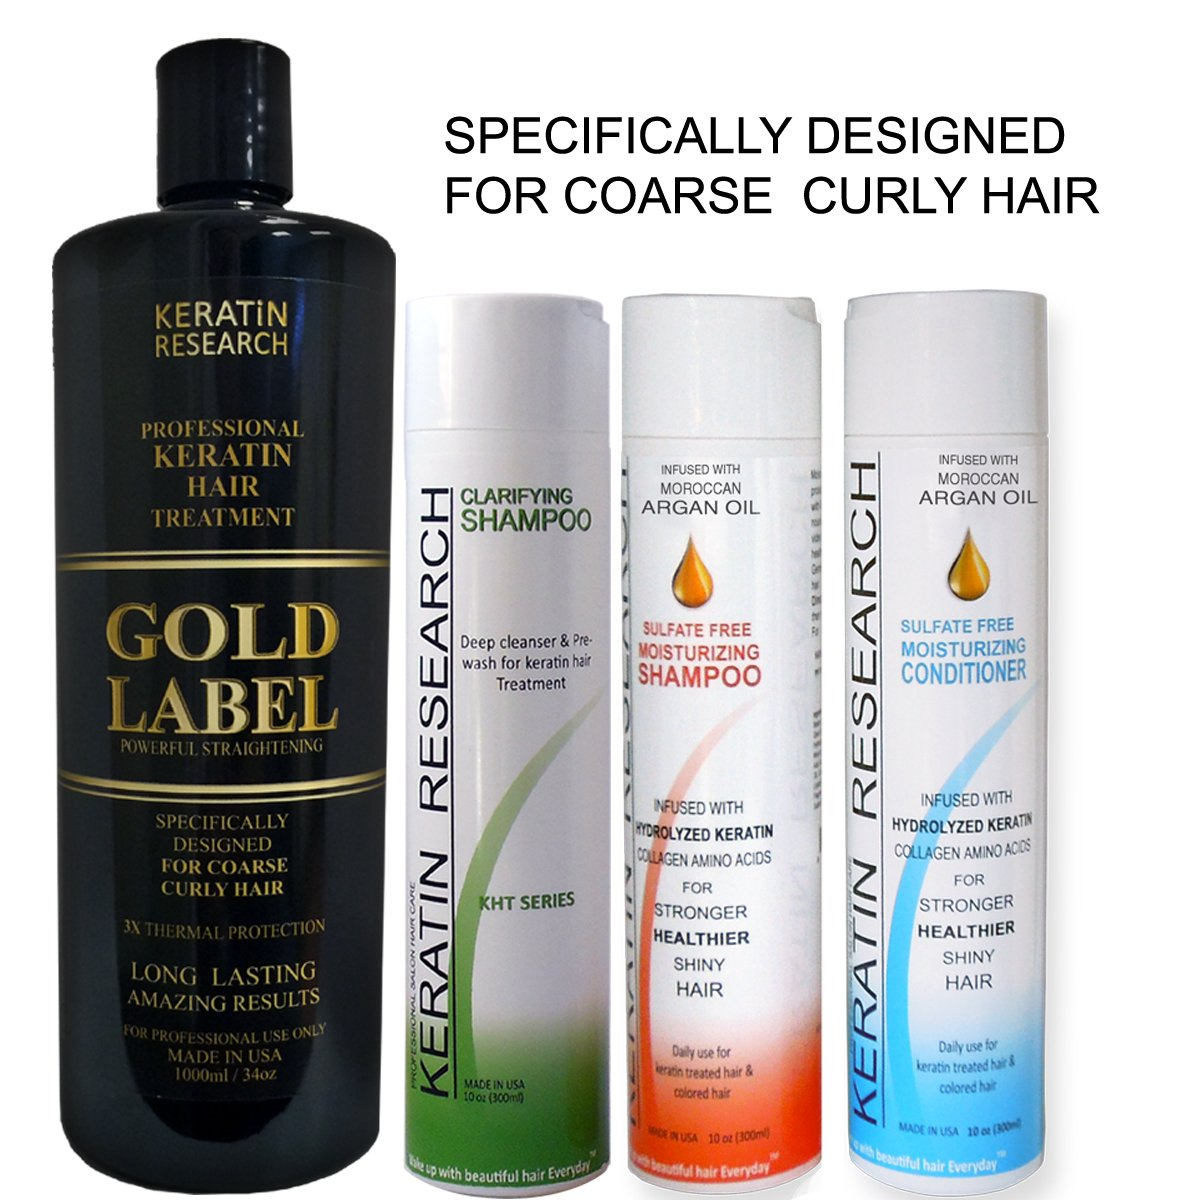 Gold Label Professional Brazilian Keratin Blowout Hair Treatment Designed for Coarse, Curly, Black, African, Dominican, and Brazilian Hair Type 1000ml Set 4 Bottles Keratina Brasilera Chocolate